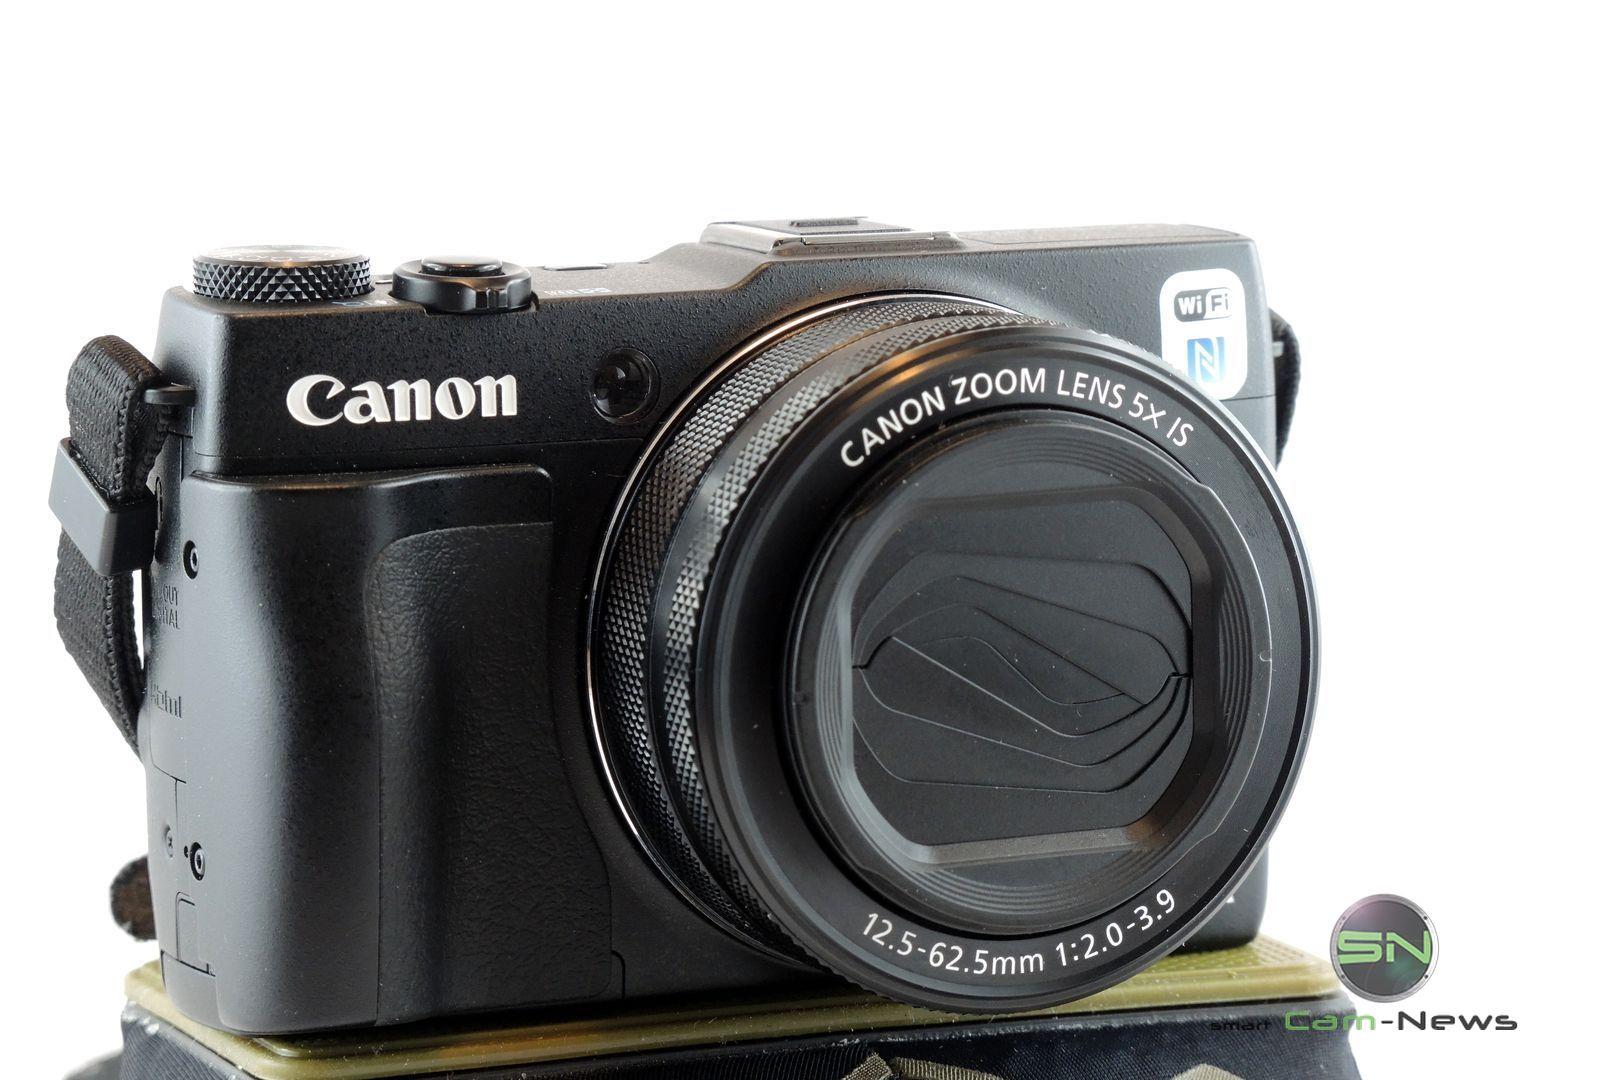 Canon G1x markii – Kompakte DSLR Zweitkamera Alternative?